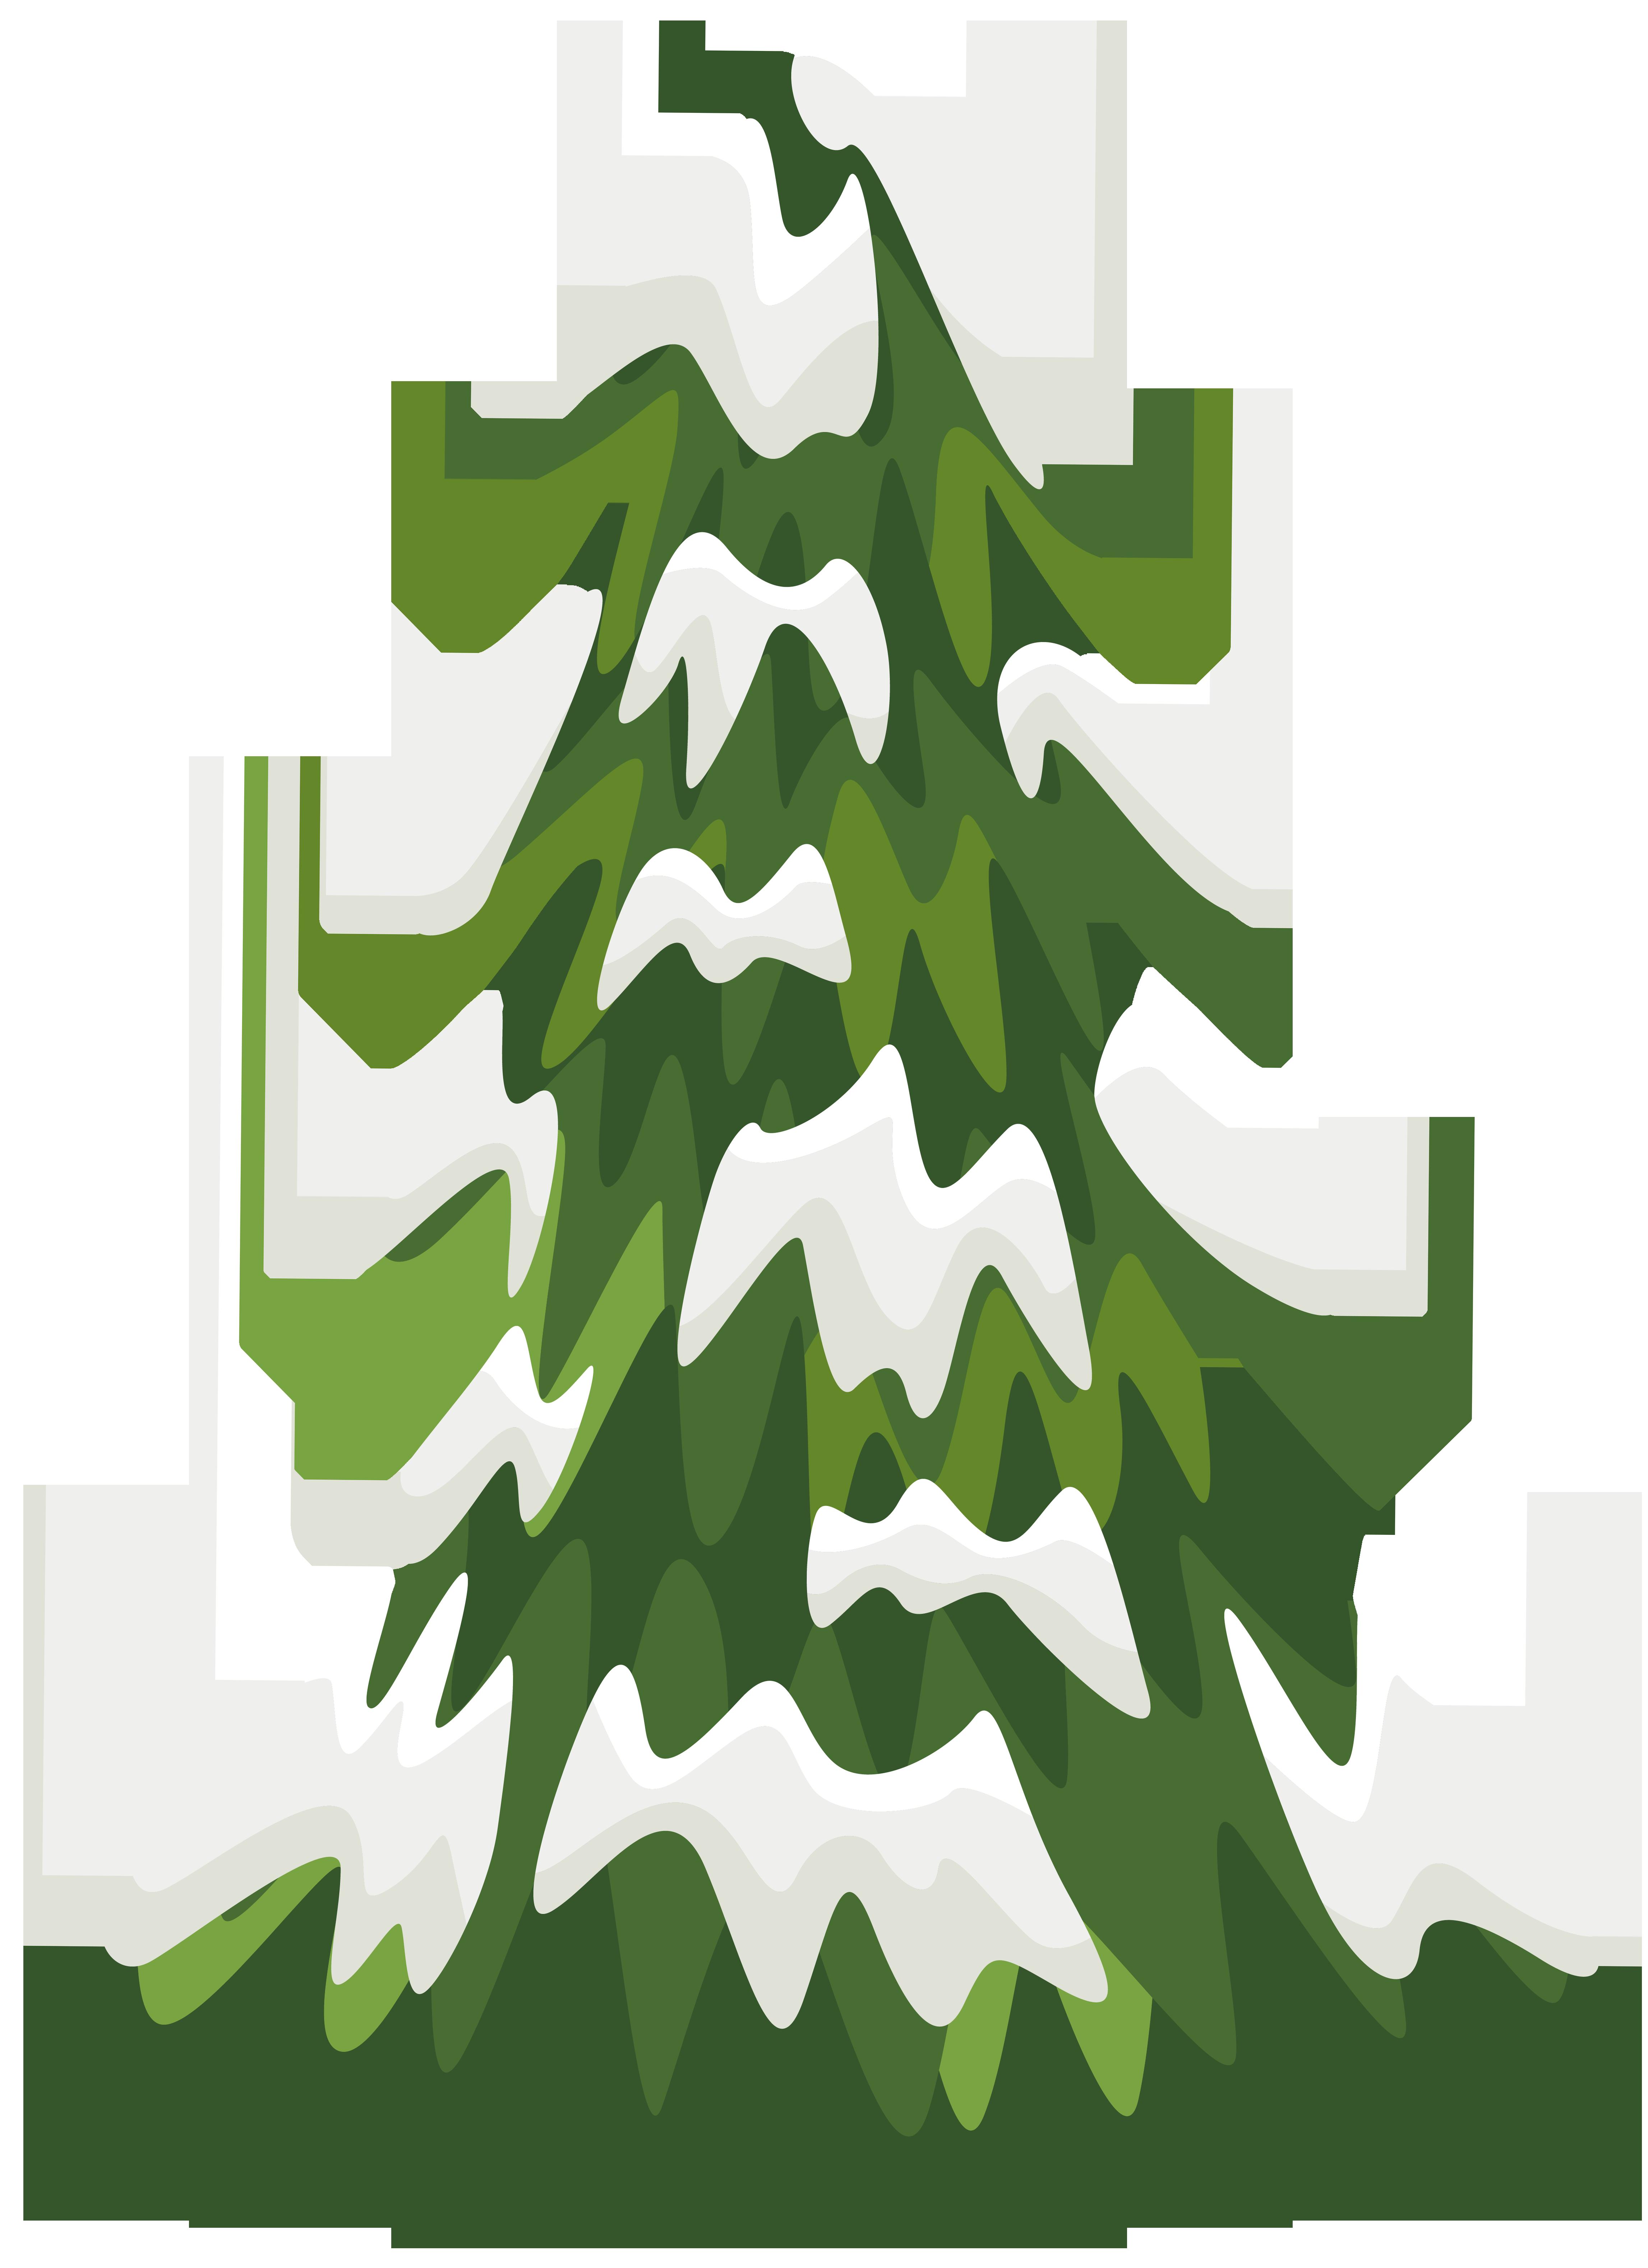 4587x6313 Pine Tree Clip Art For Christmas Fun